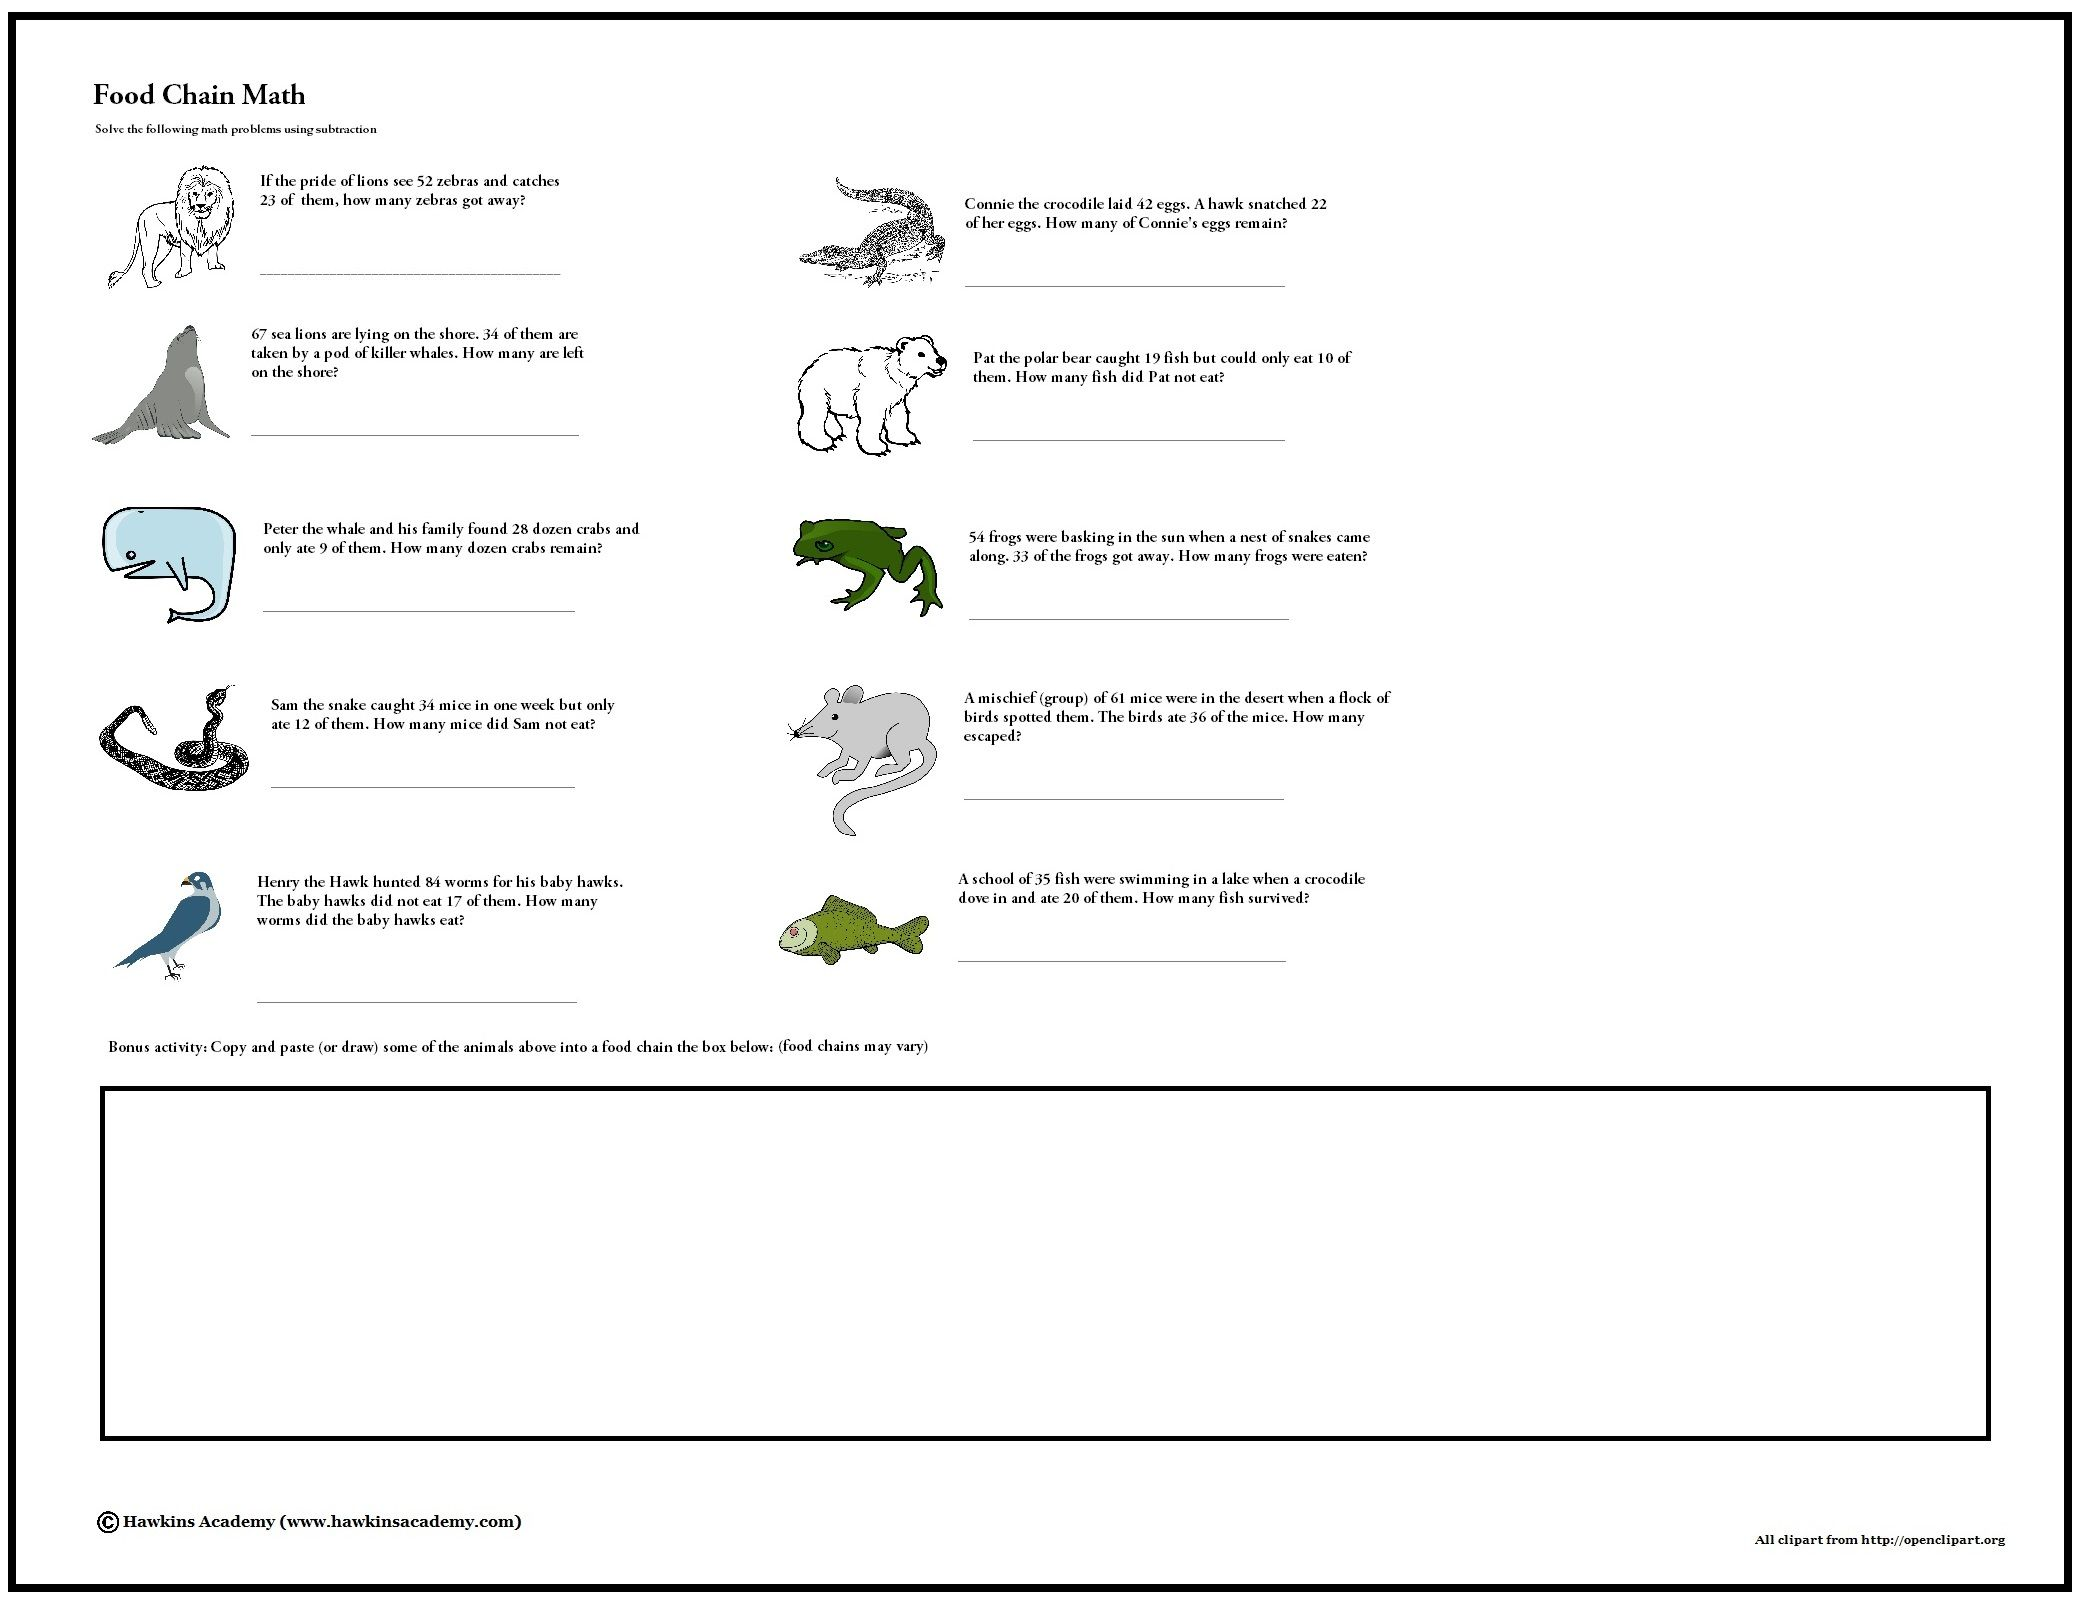 Food Chain Math Free Download